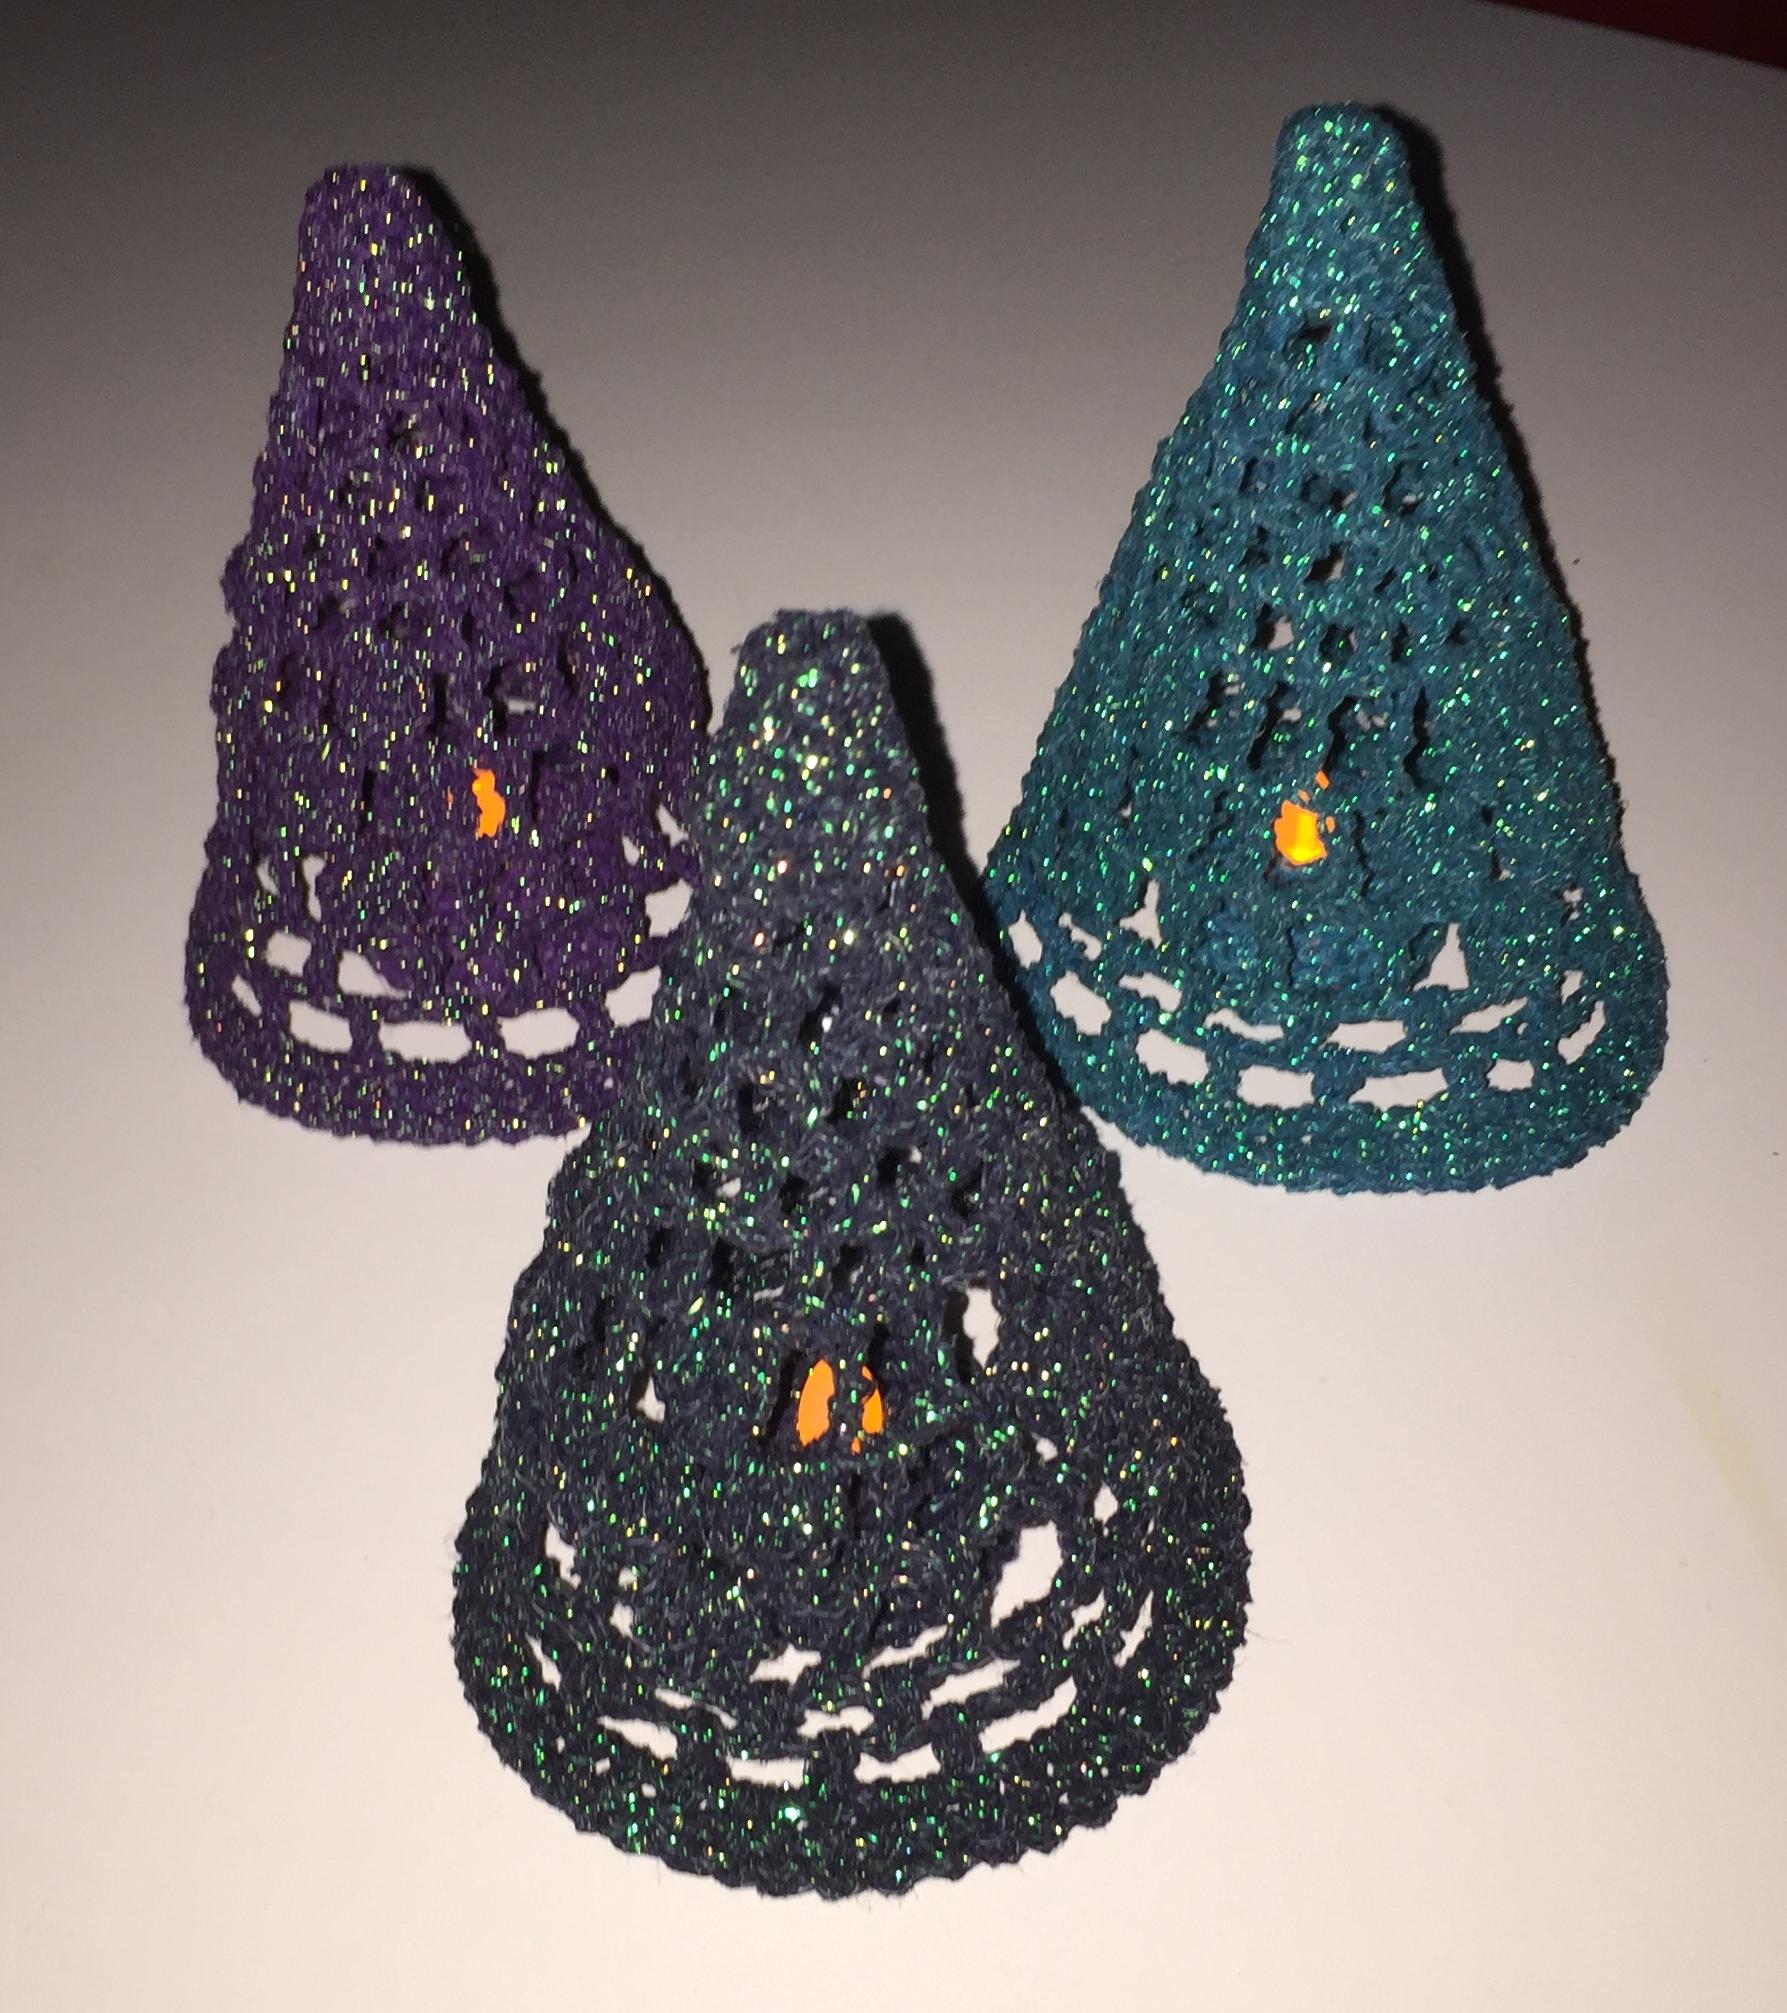 Hæklekit juletræ /Lyskegle